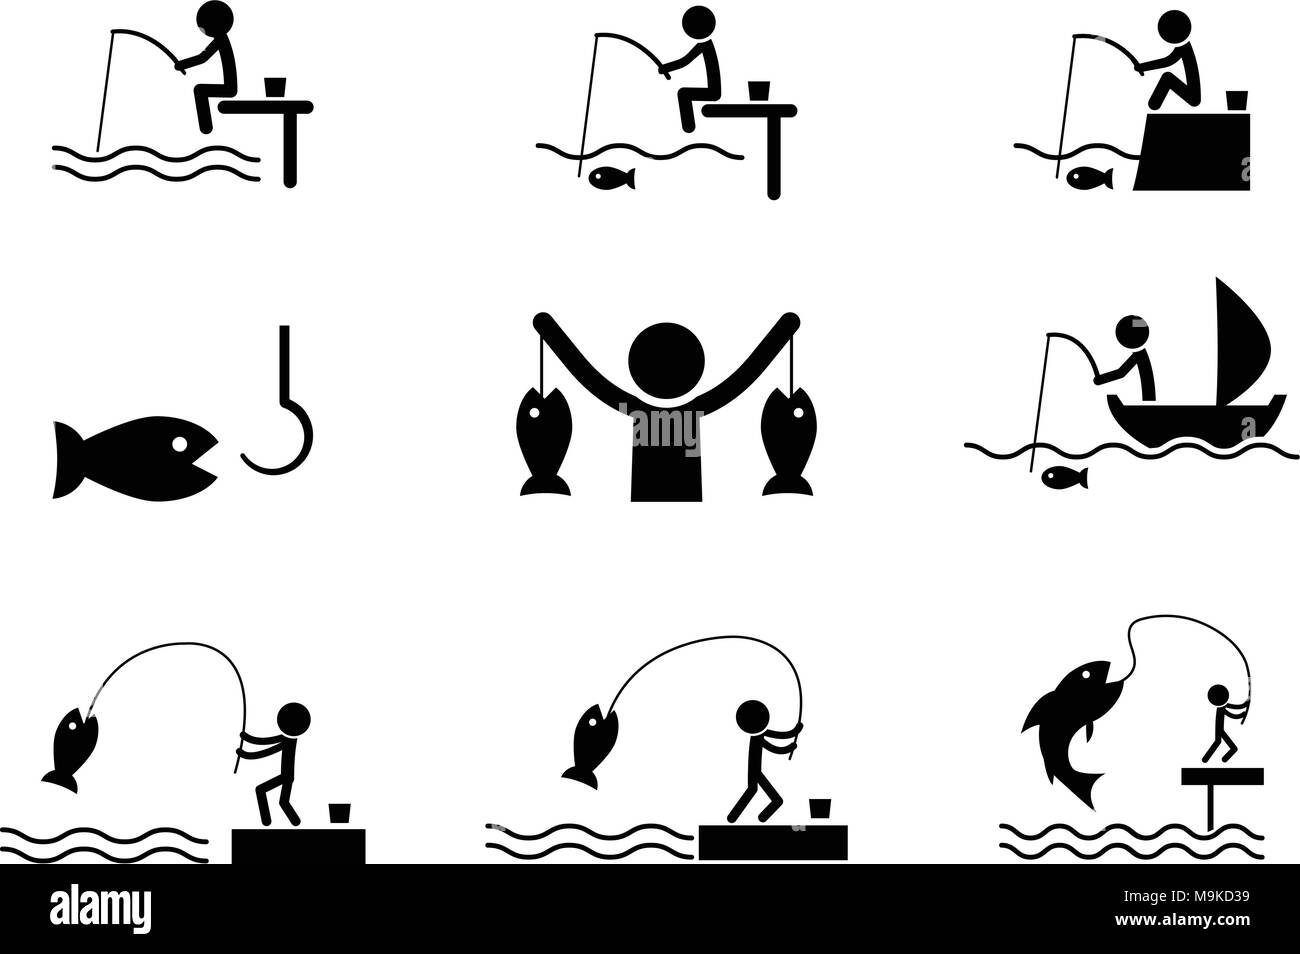 Fishing Icons Stock Photos Fishing Icons Stock Images Alamy